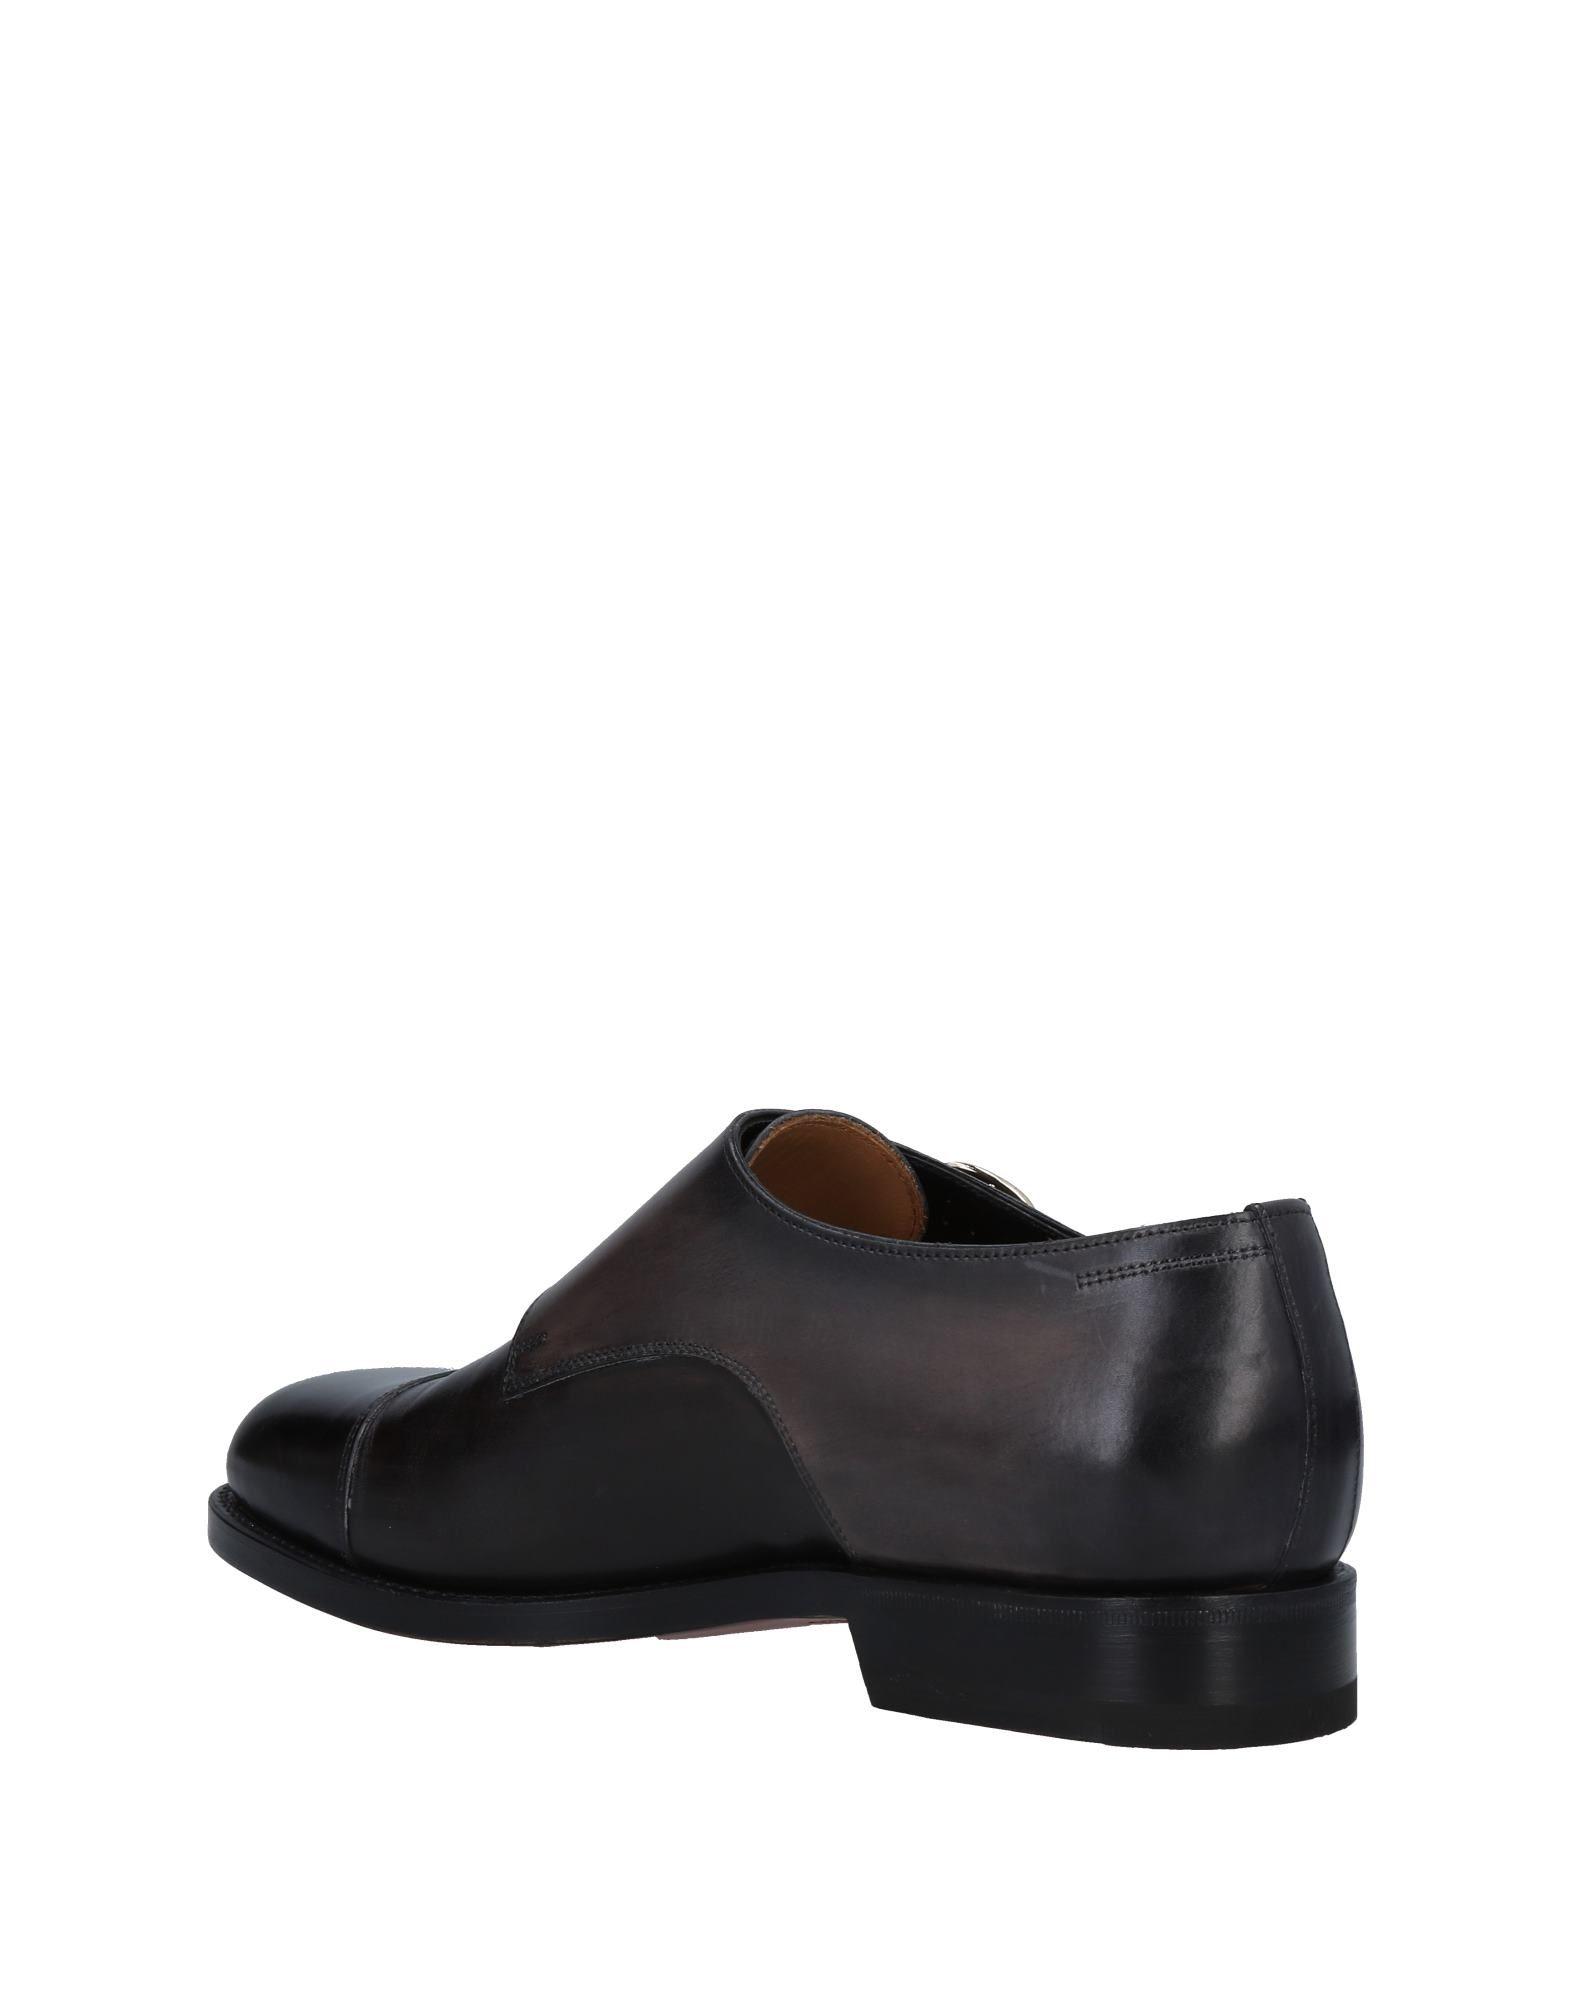 Santoni Mokassins Herren  11488708BA Gute Qualität beliebte Schuhe